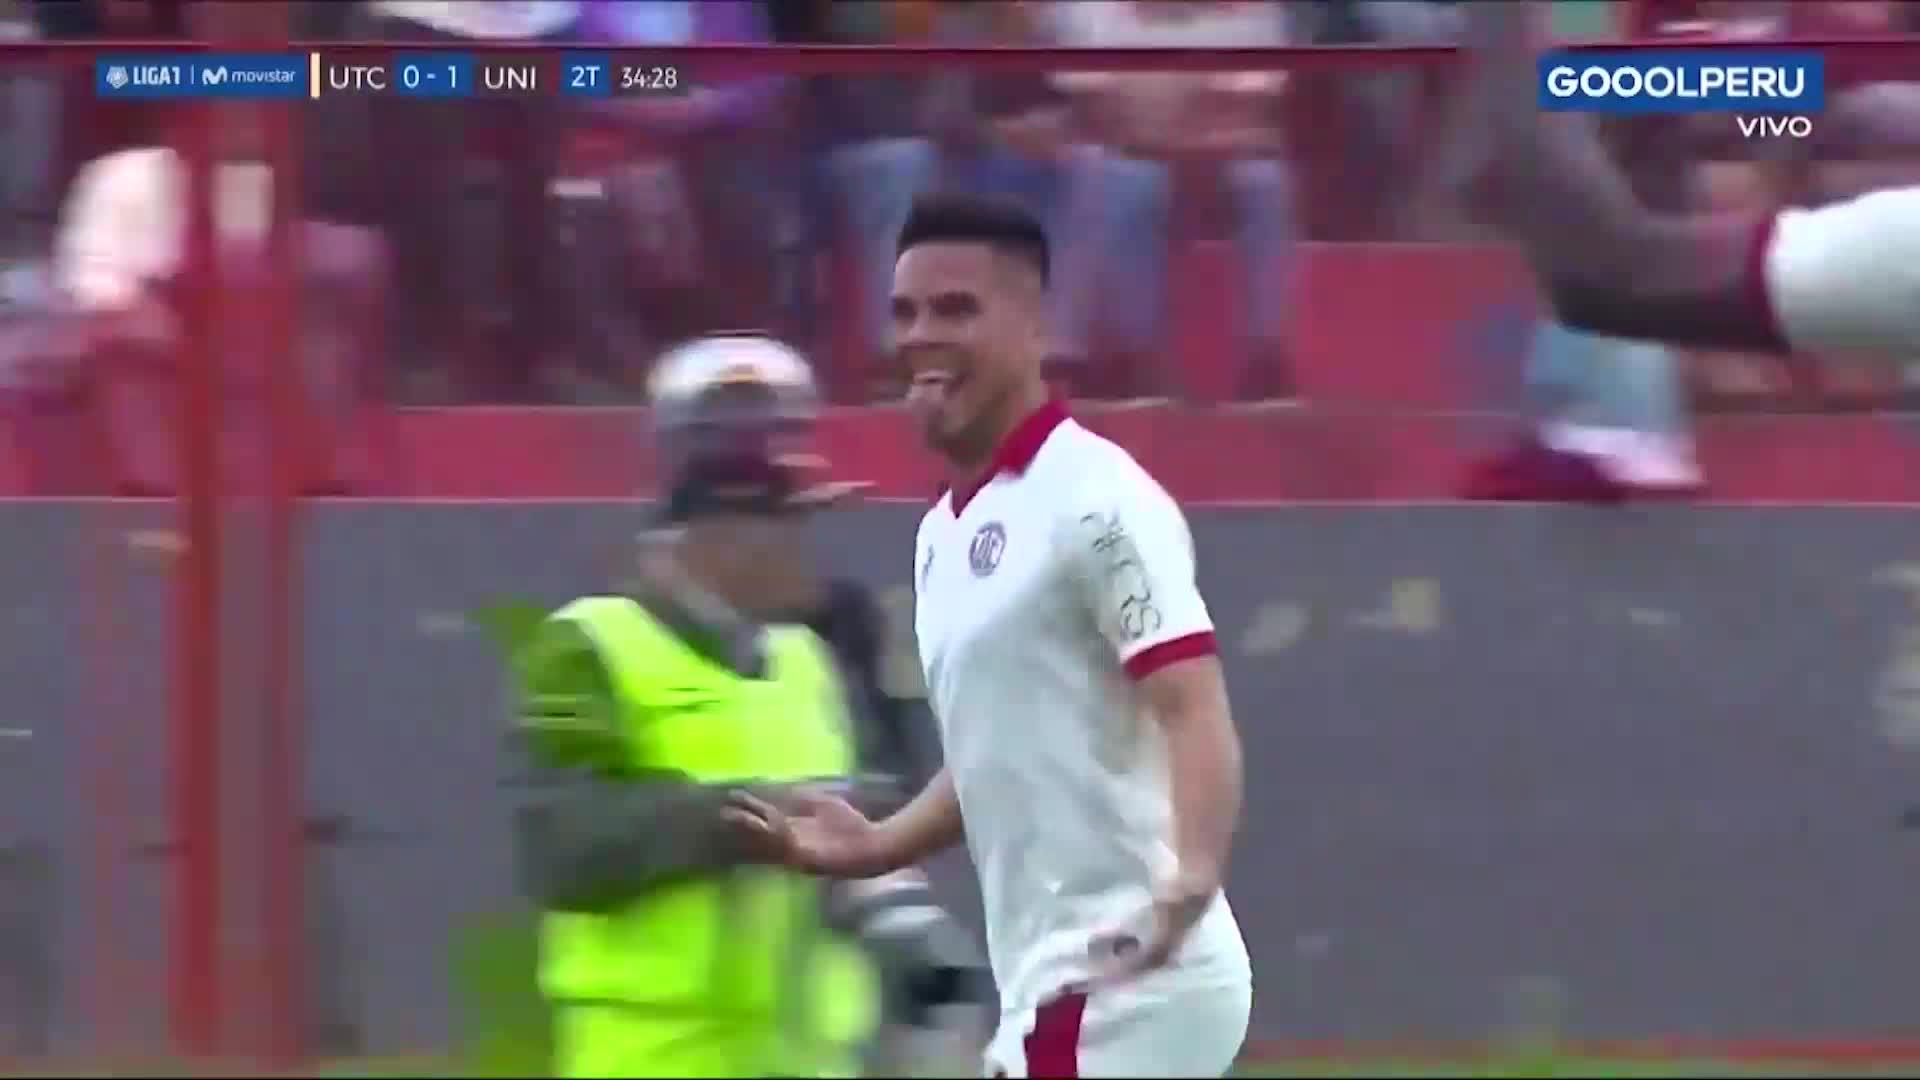 Universitario vs. UTC: Janio Pósito decretó el 1-1 en Cajamarca [VIDEO] - Diario Perú21